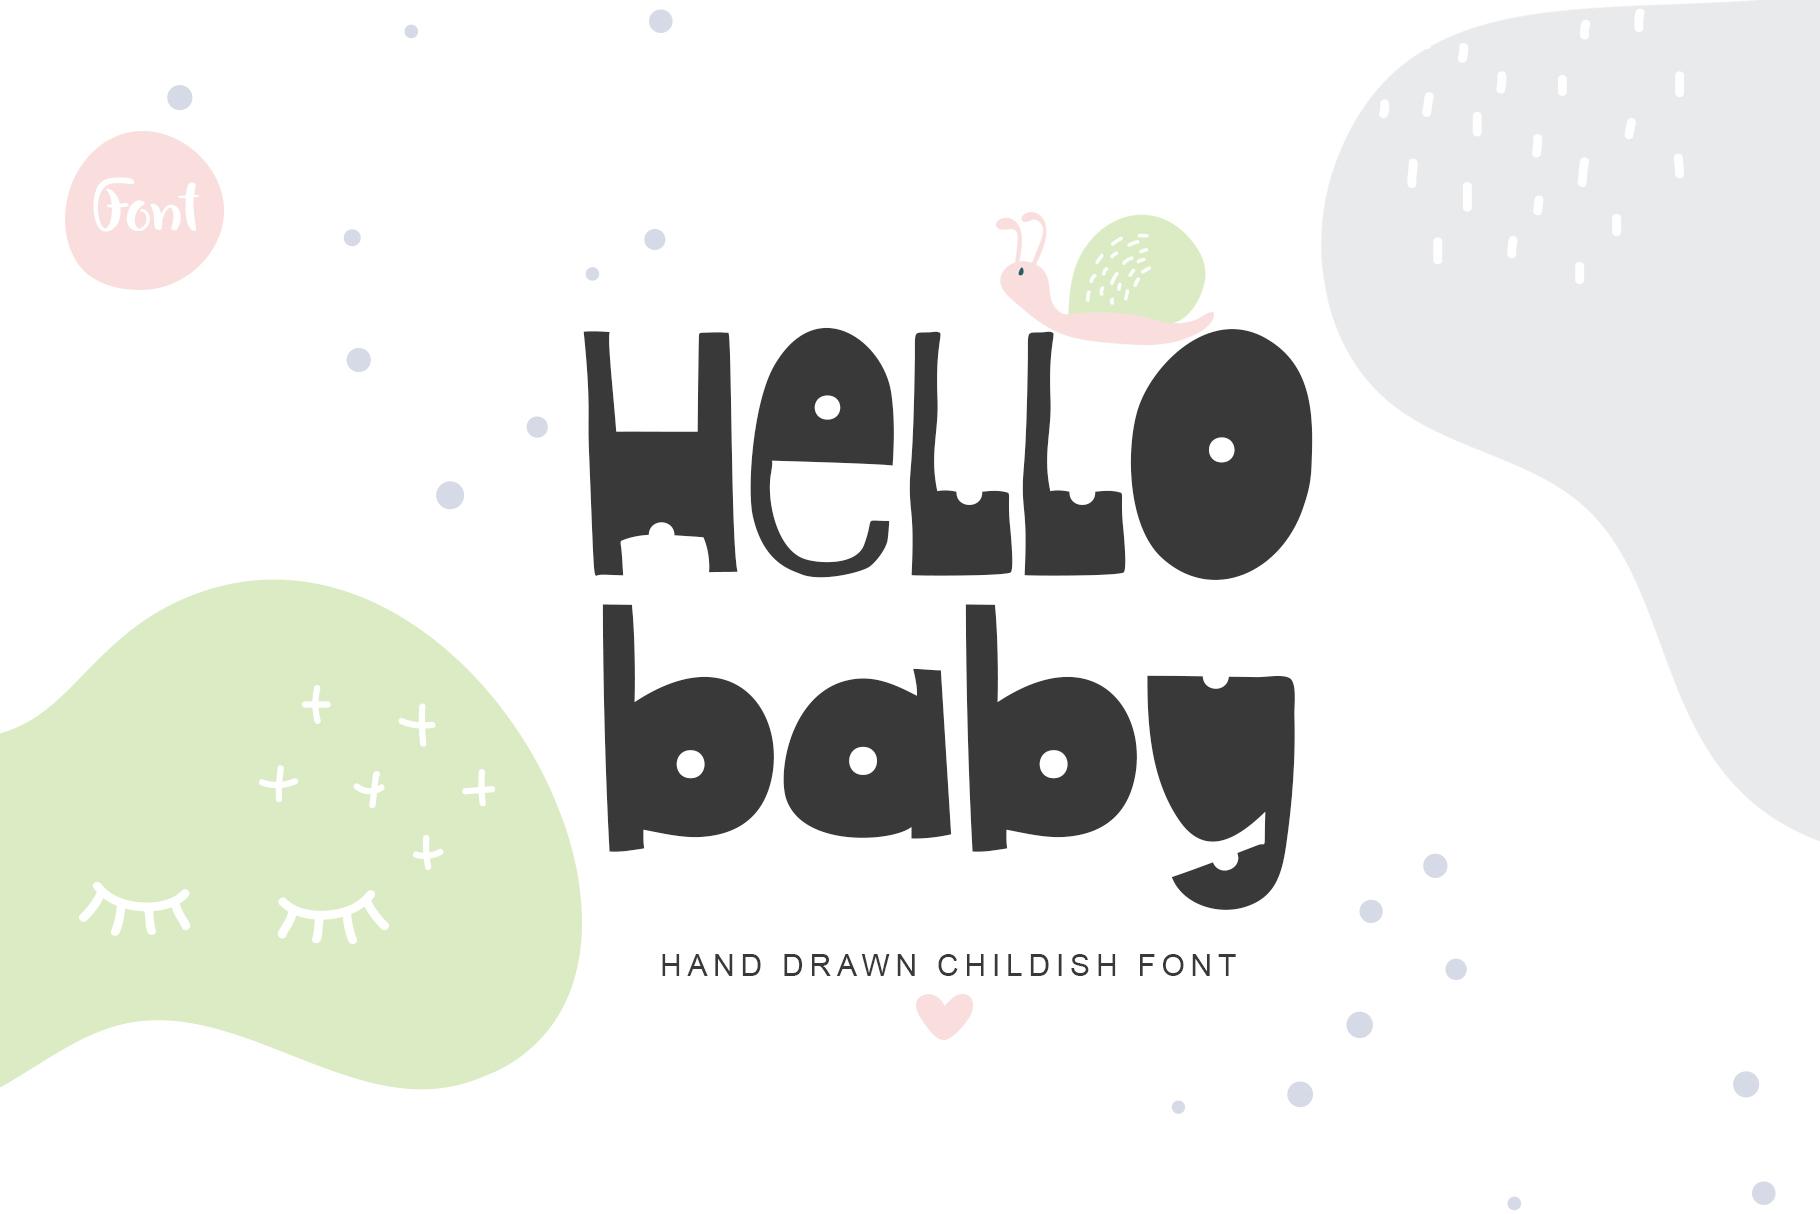 Kids Handwriting Font 2021: Hello Baby Childish Font - title01 2